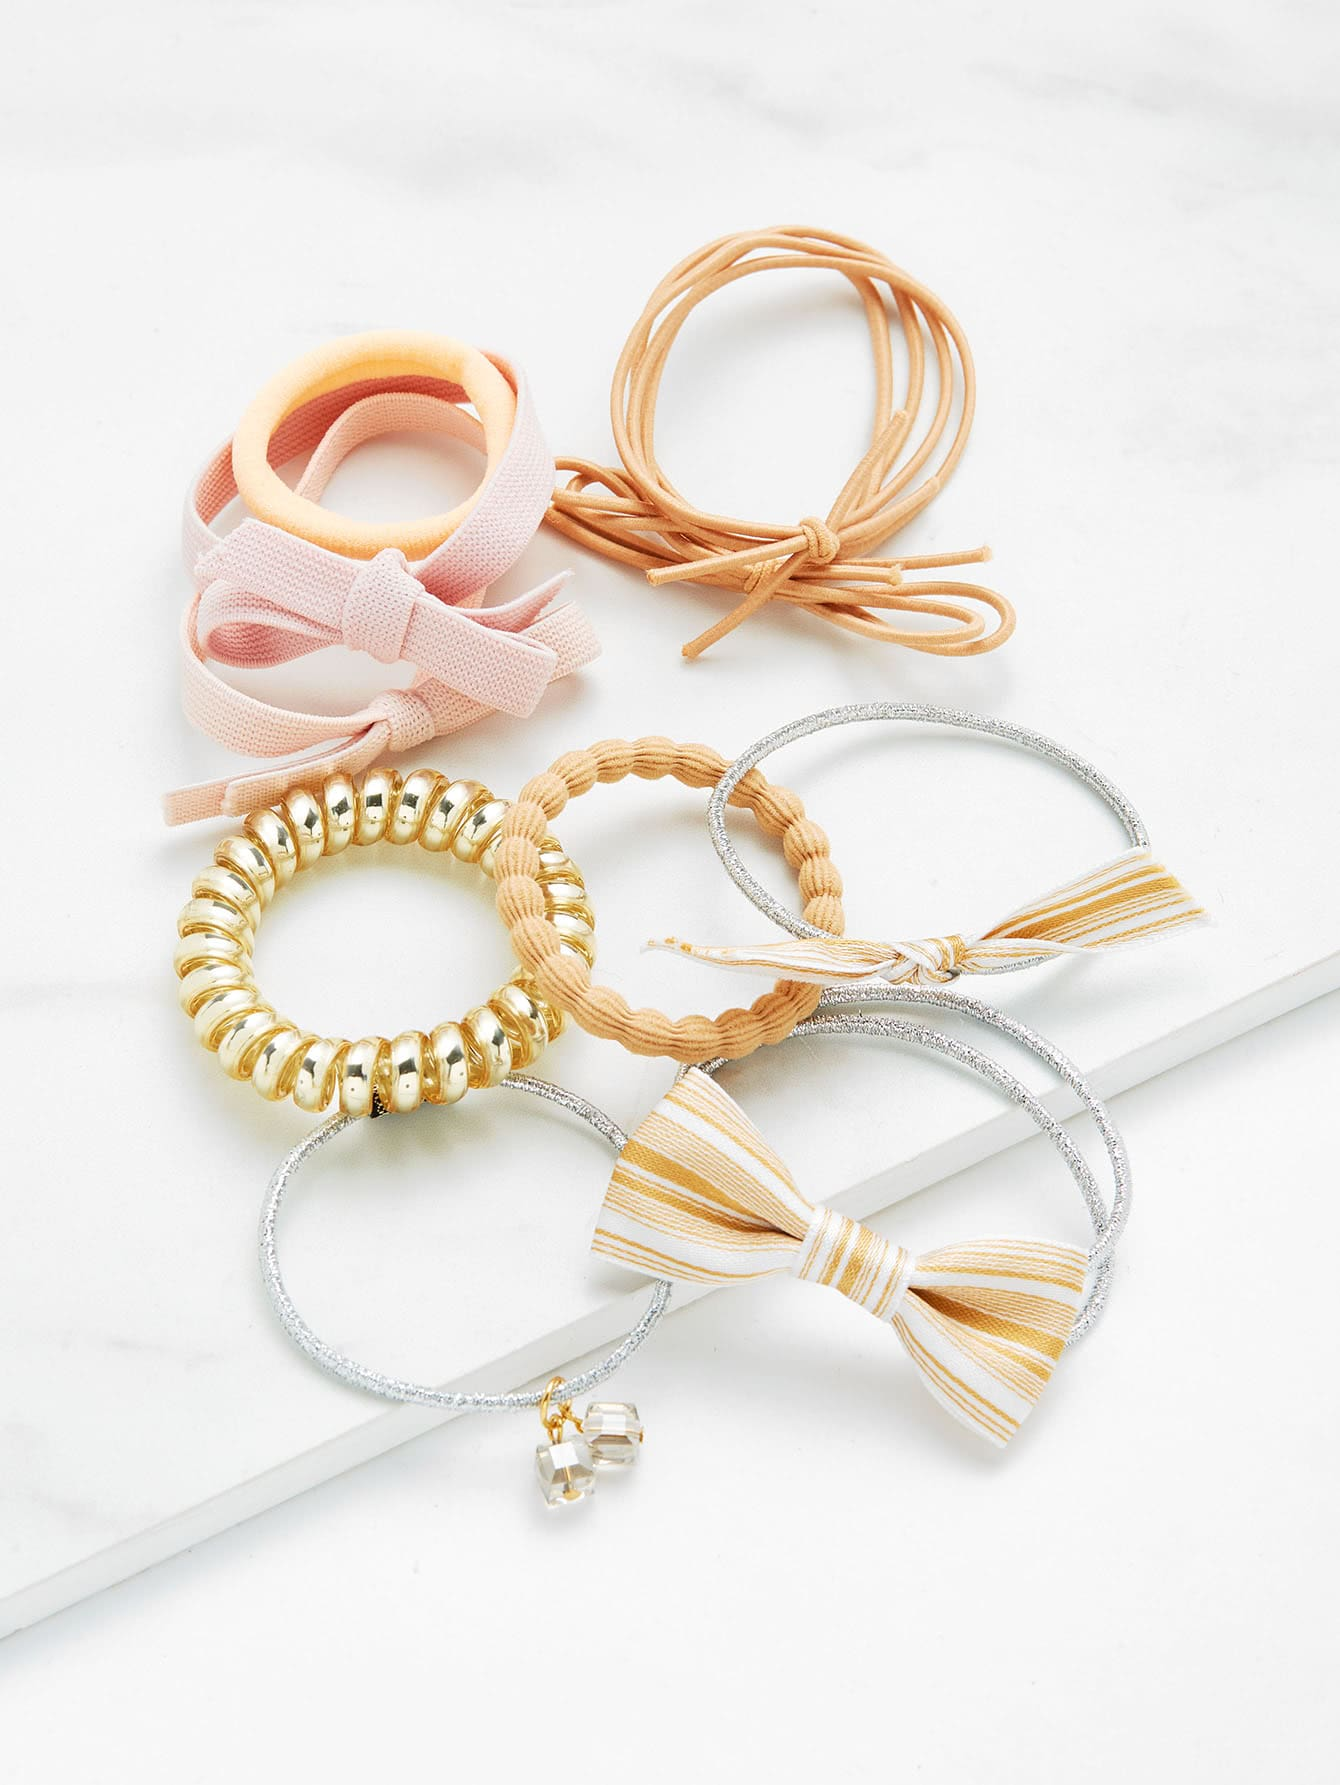 все цены на  Coil & Knotted Hair Tie 10pcs With Mesh Bag  онлайн